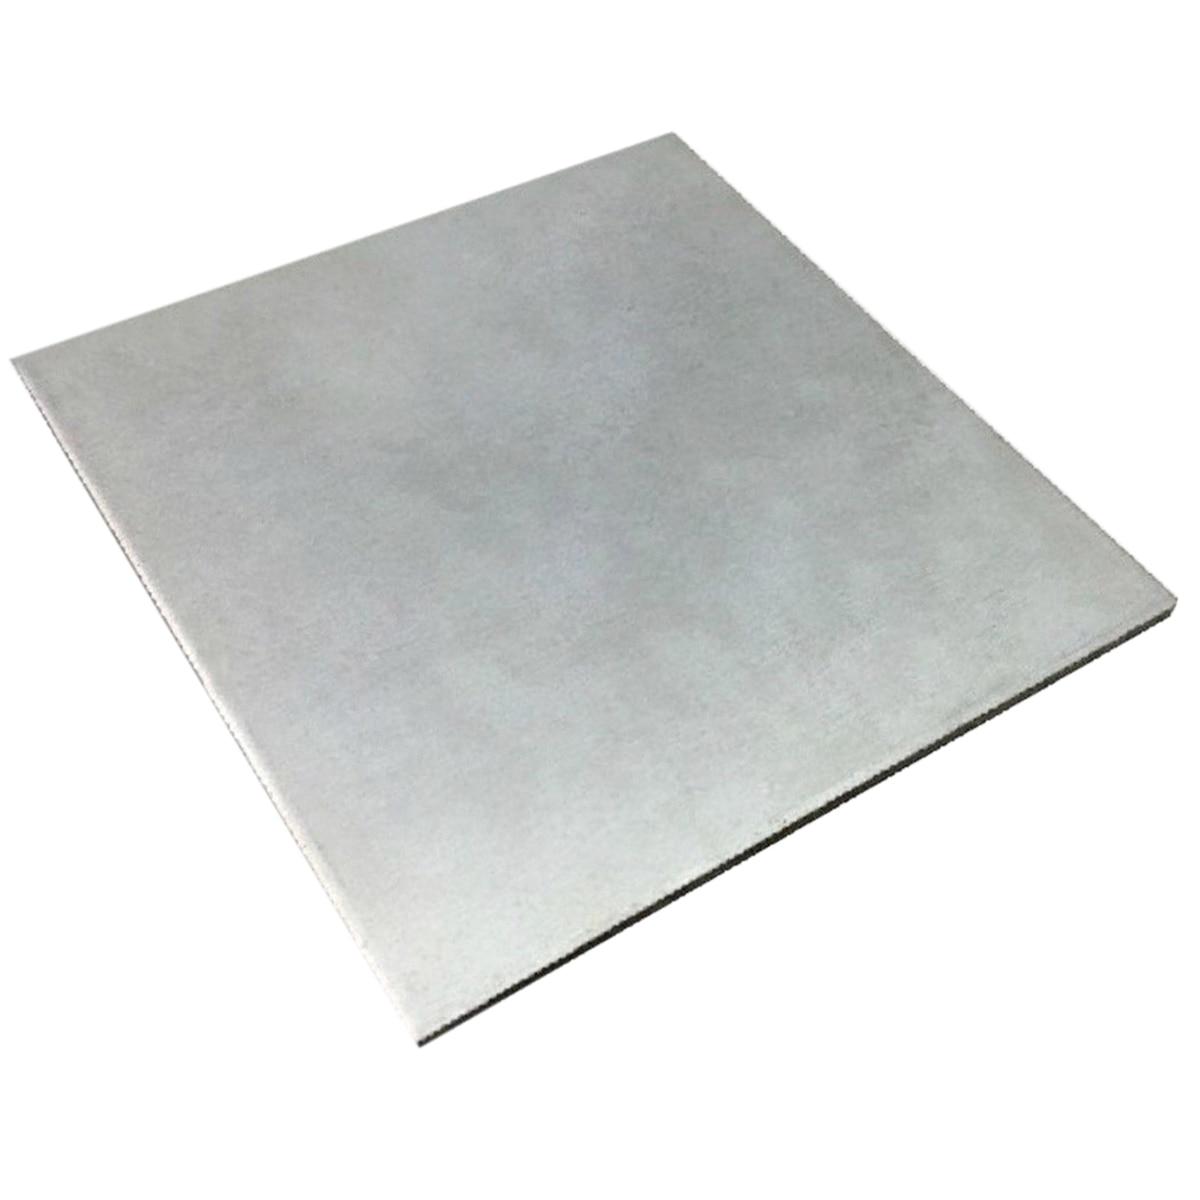 1pc High Purity Metal Thin Titanium Plate 0.5mm Thickness TC4/GR5 ASTM B54 Ti Sheet Foil 100mmx100mm 1sheet matte surface 3k 100% carbon fiber plate sheet 2mm thickness